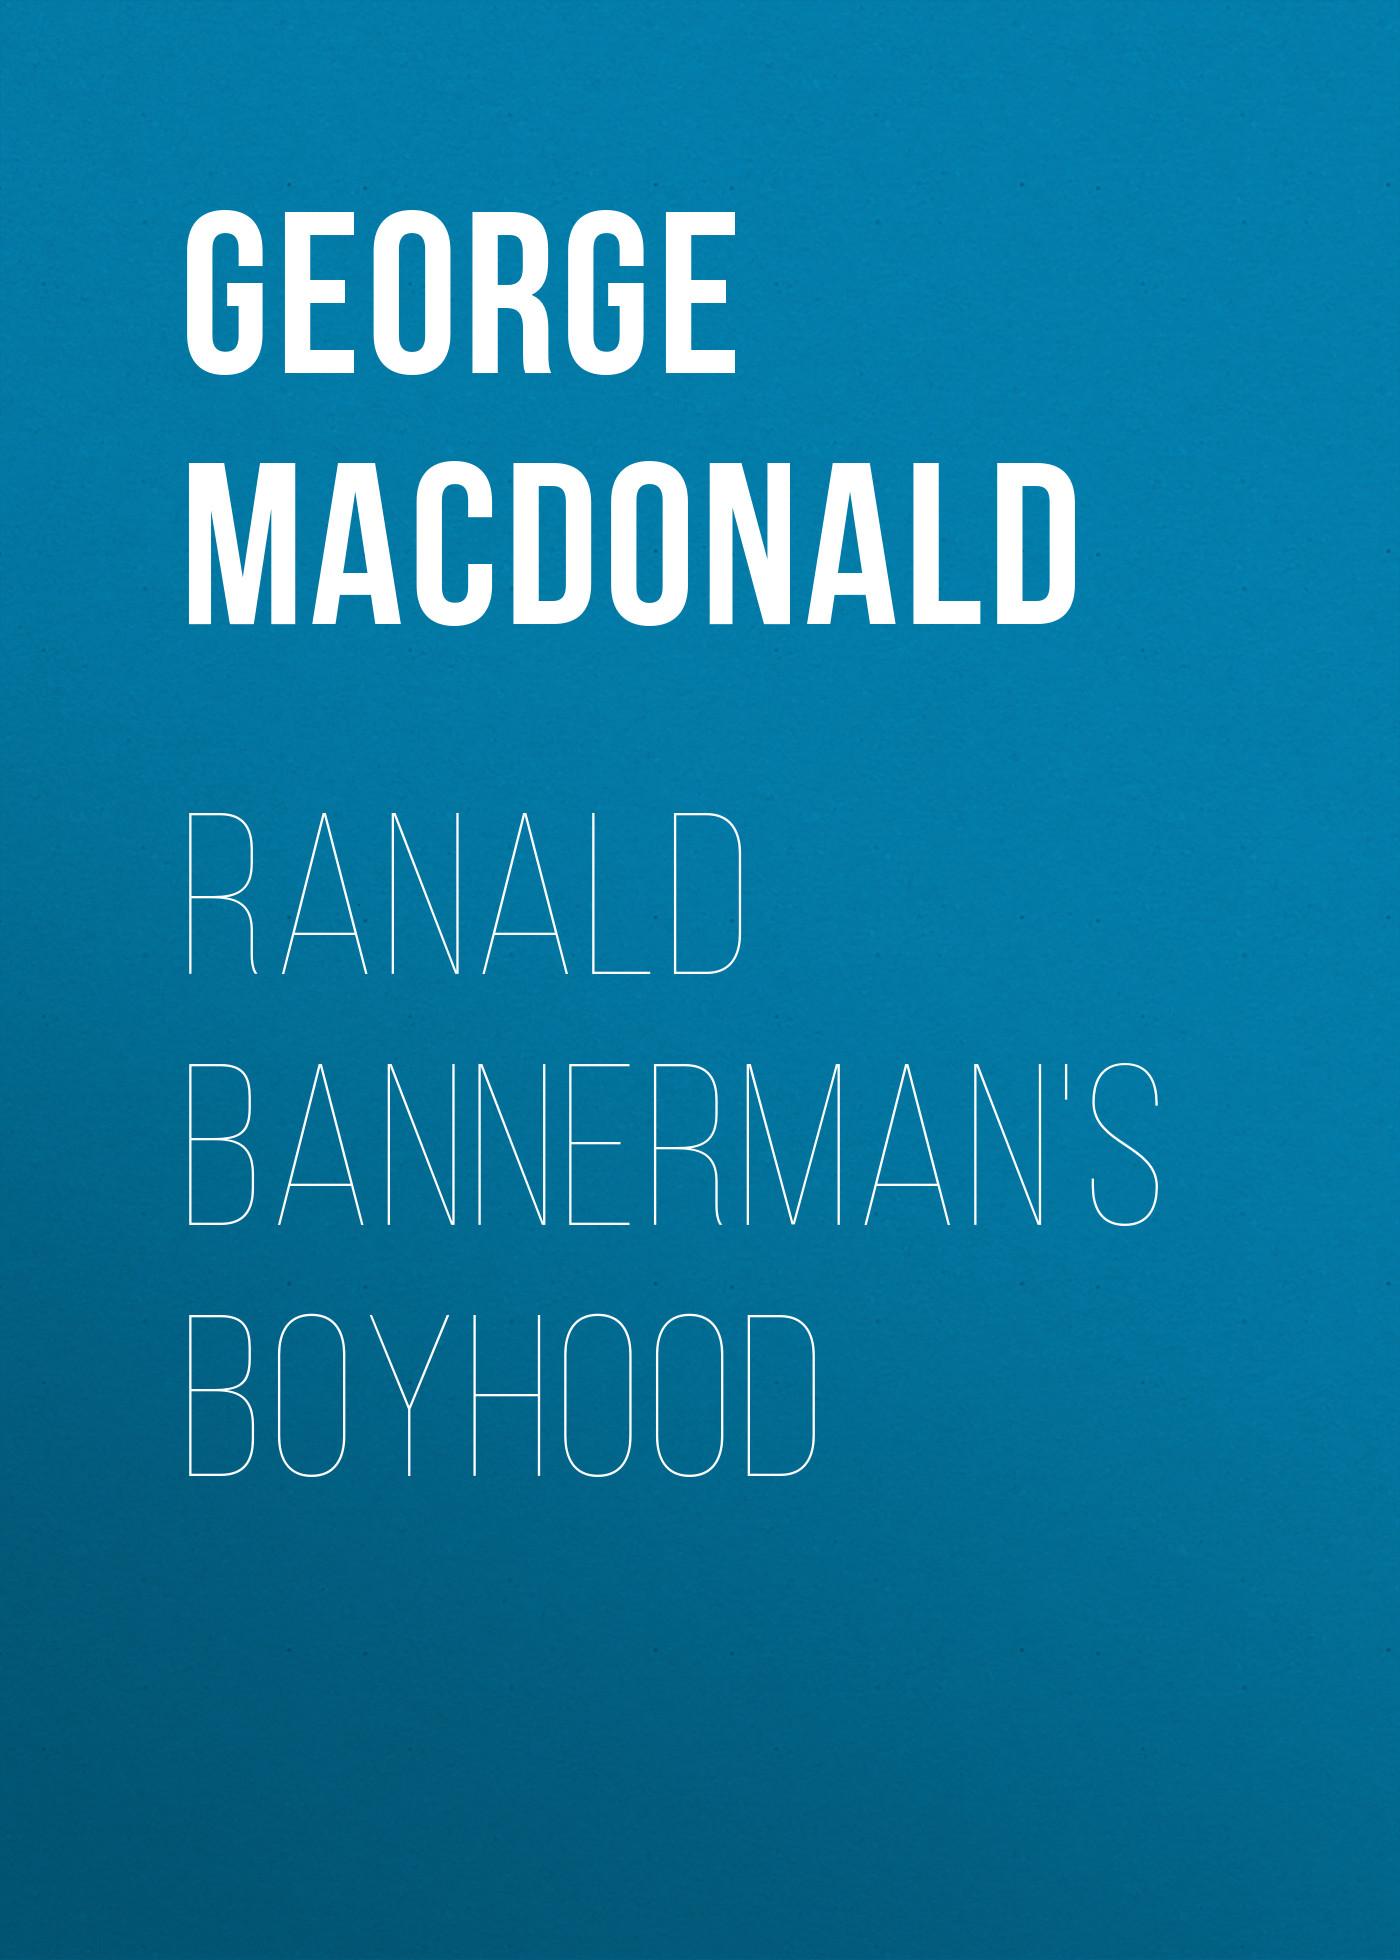 George MacDonald Ranald Bannerman's Boyhood childhood boyhood and youth